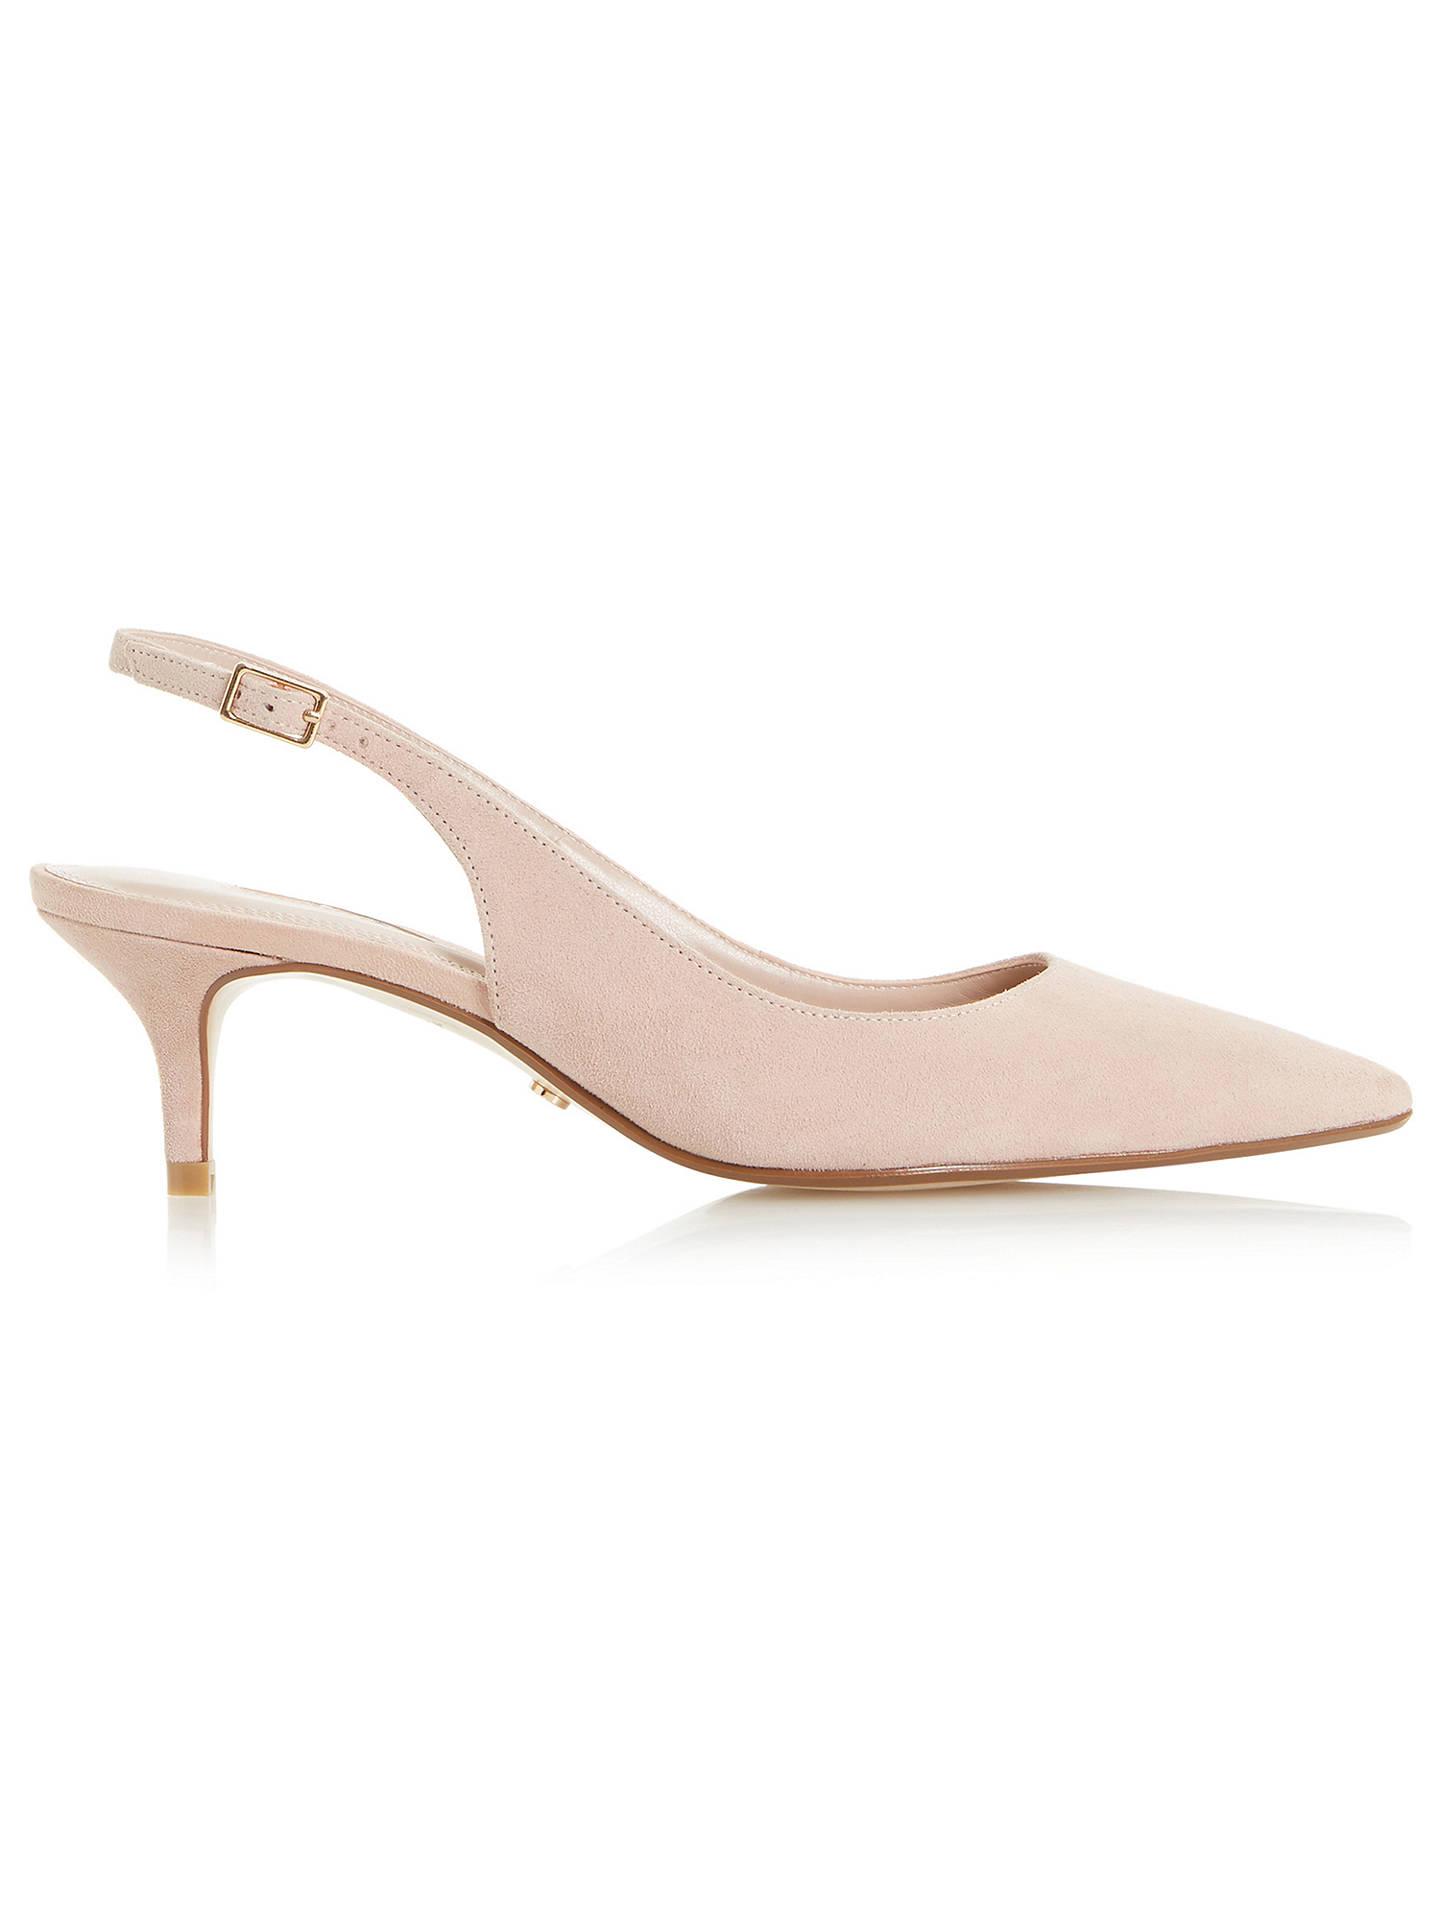 dfc7c0d714c84 Buy Dune Casandra Kitten Heel Slingback Court Shoes